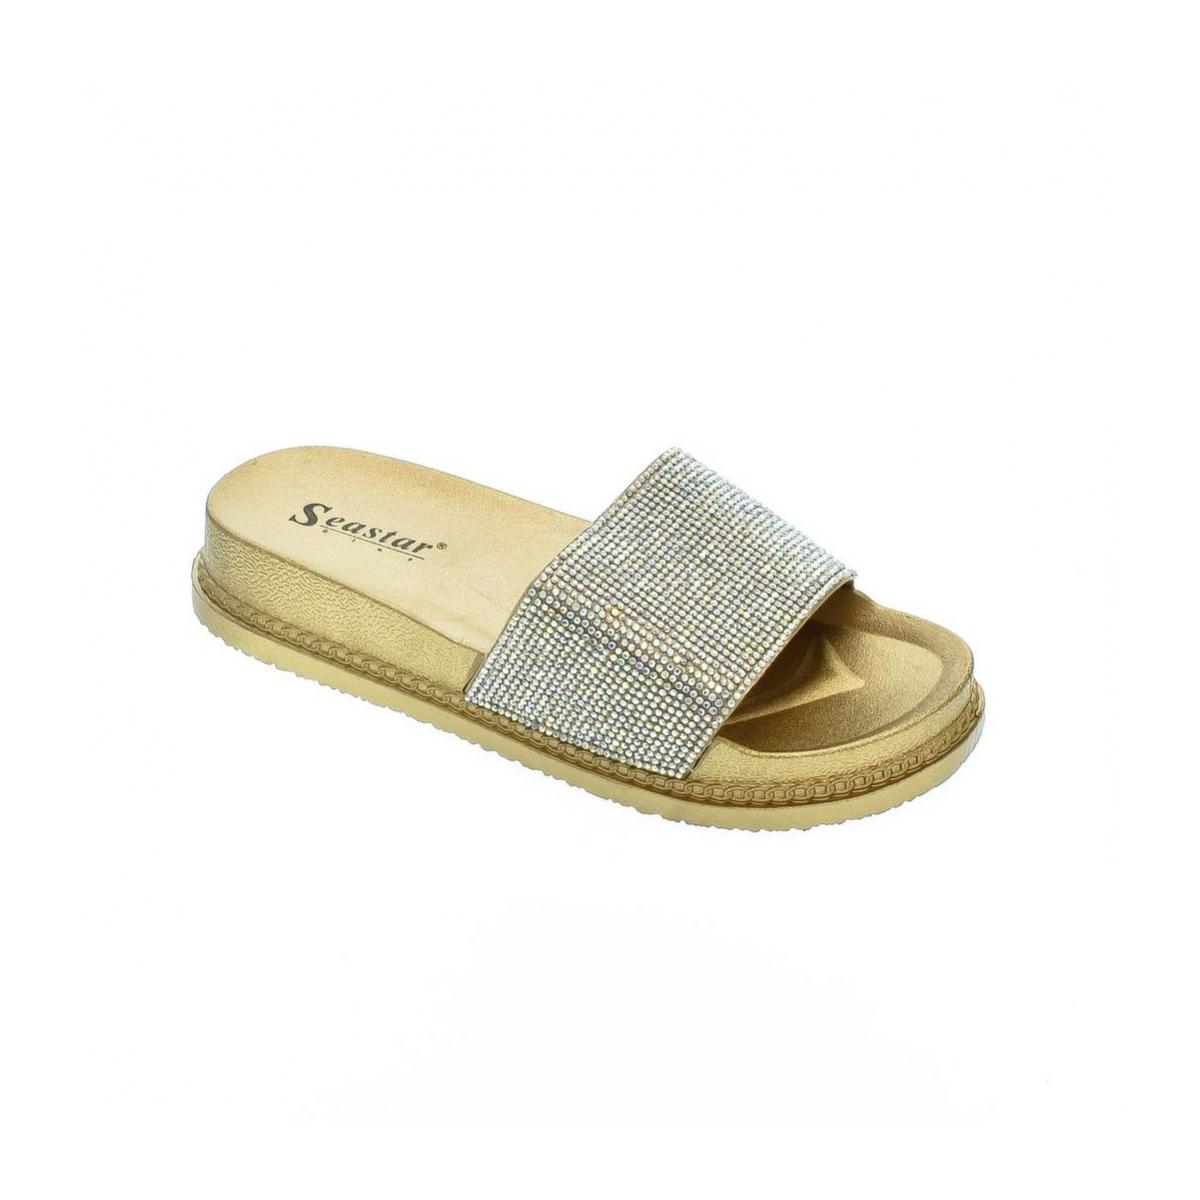 Dámske zlaté šľapky DANEA - 2 9176d03a9a3